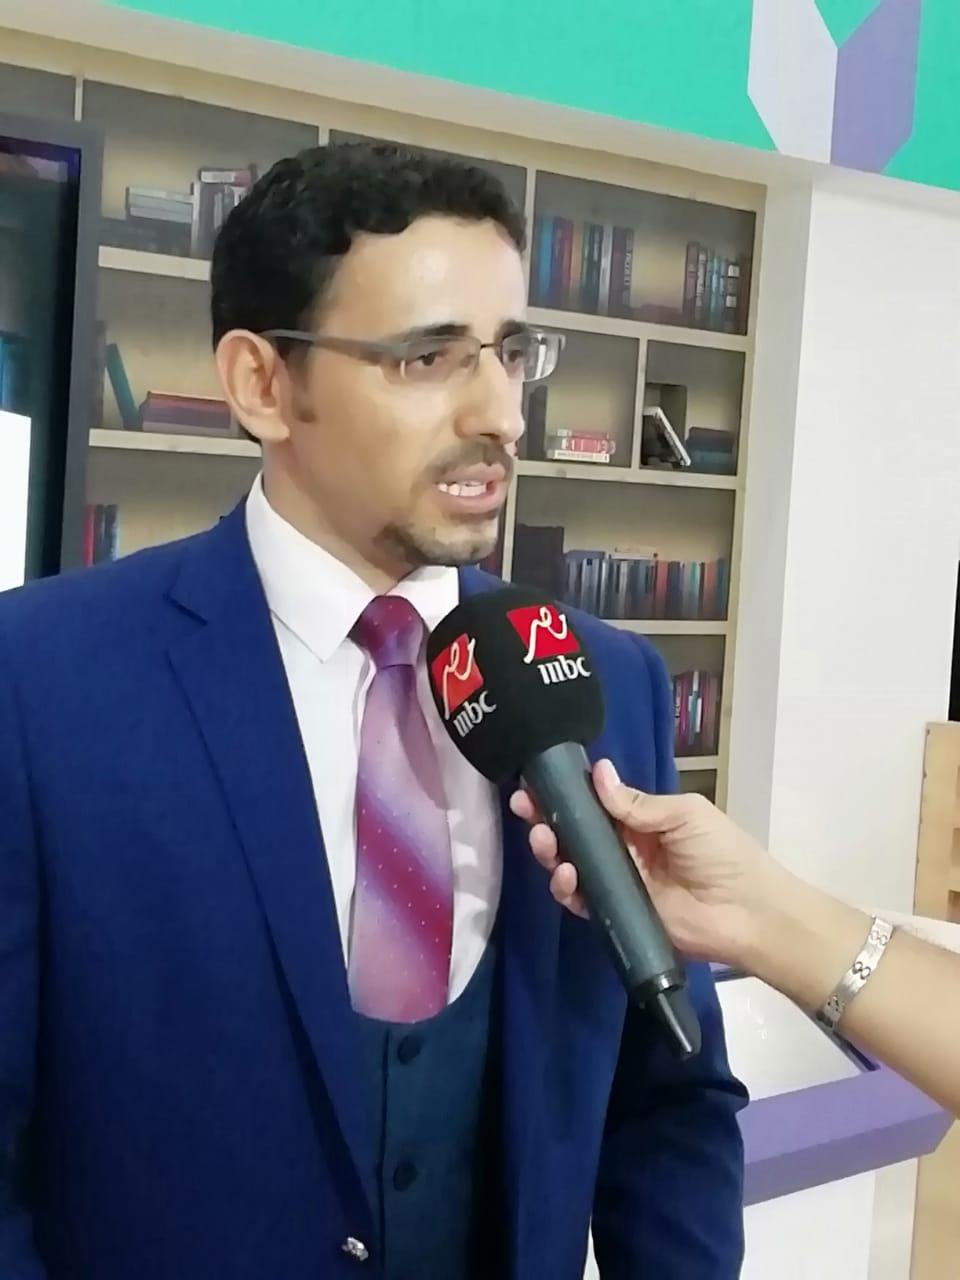 Photo of عبد الظاهر يوقع كتاب صحافة الذكاء الاصطناعي بمعرض الشارقة